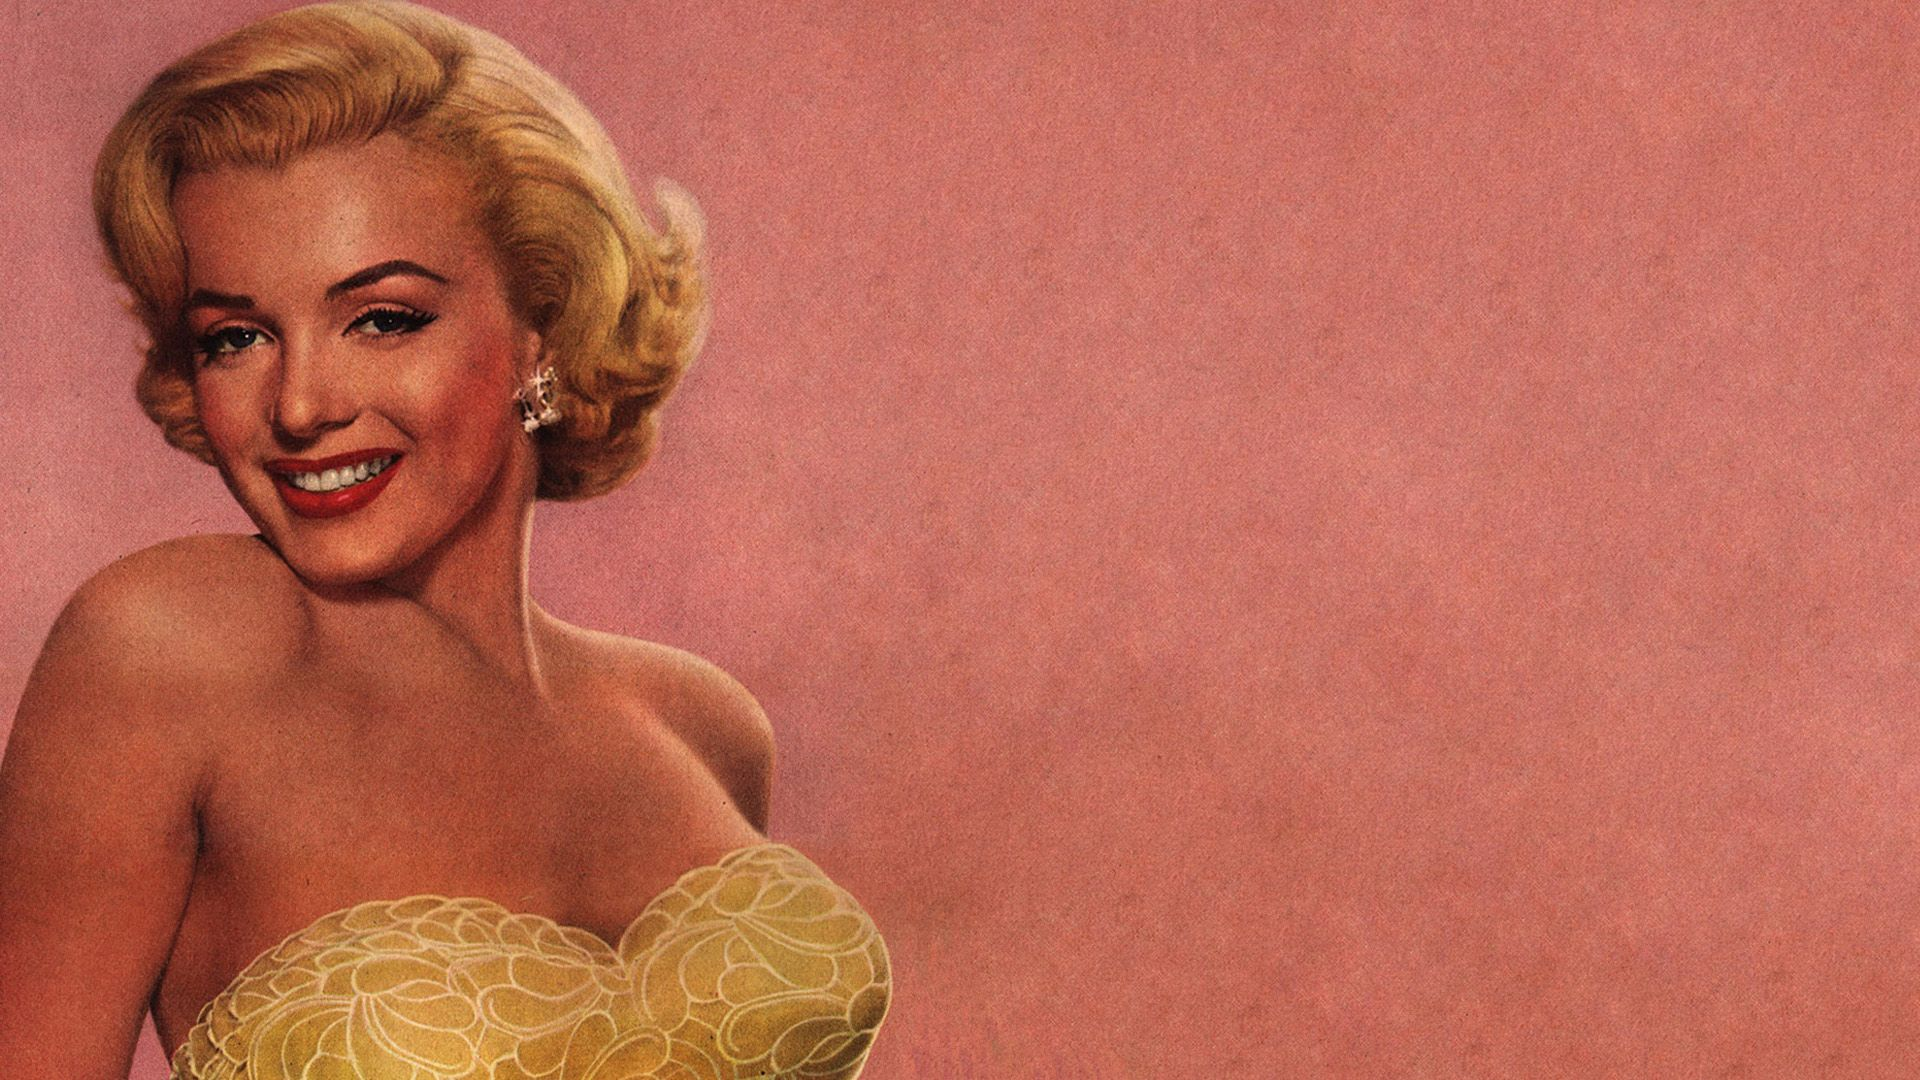 marilyn monroe wallpaper Marilyn Monroe Classic Vintage